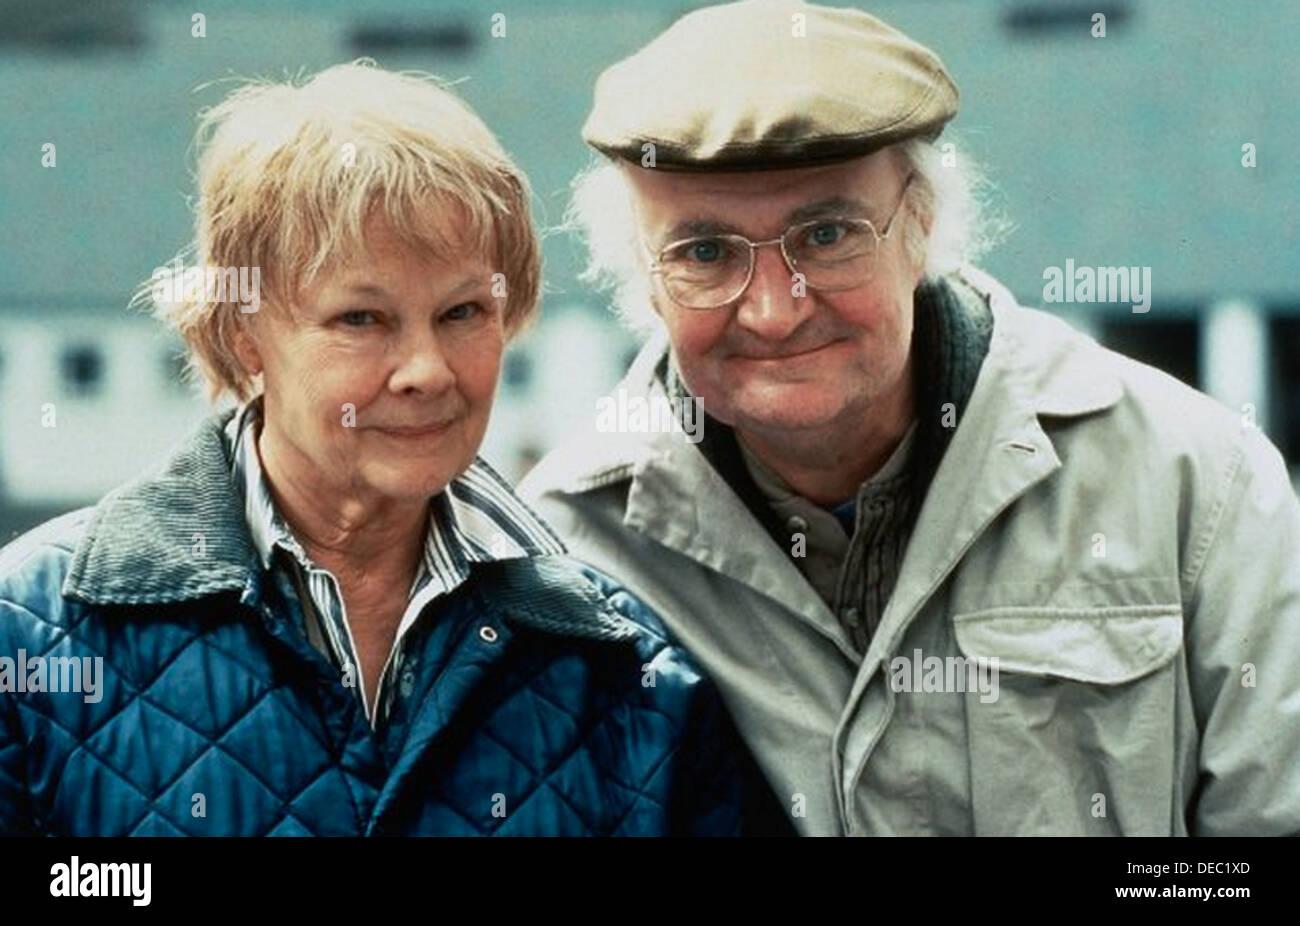 IRIS 2001 Touchstone Pictures Film con Judi Dench y Jim Broadbent Foto de stock